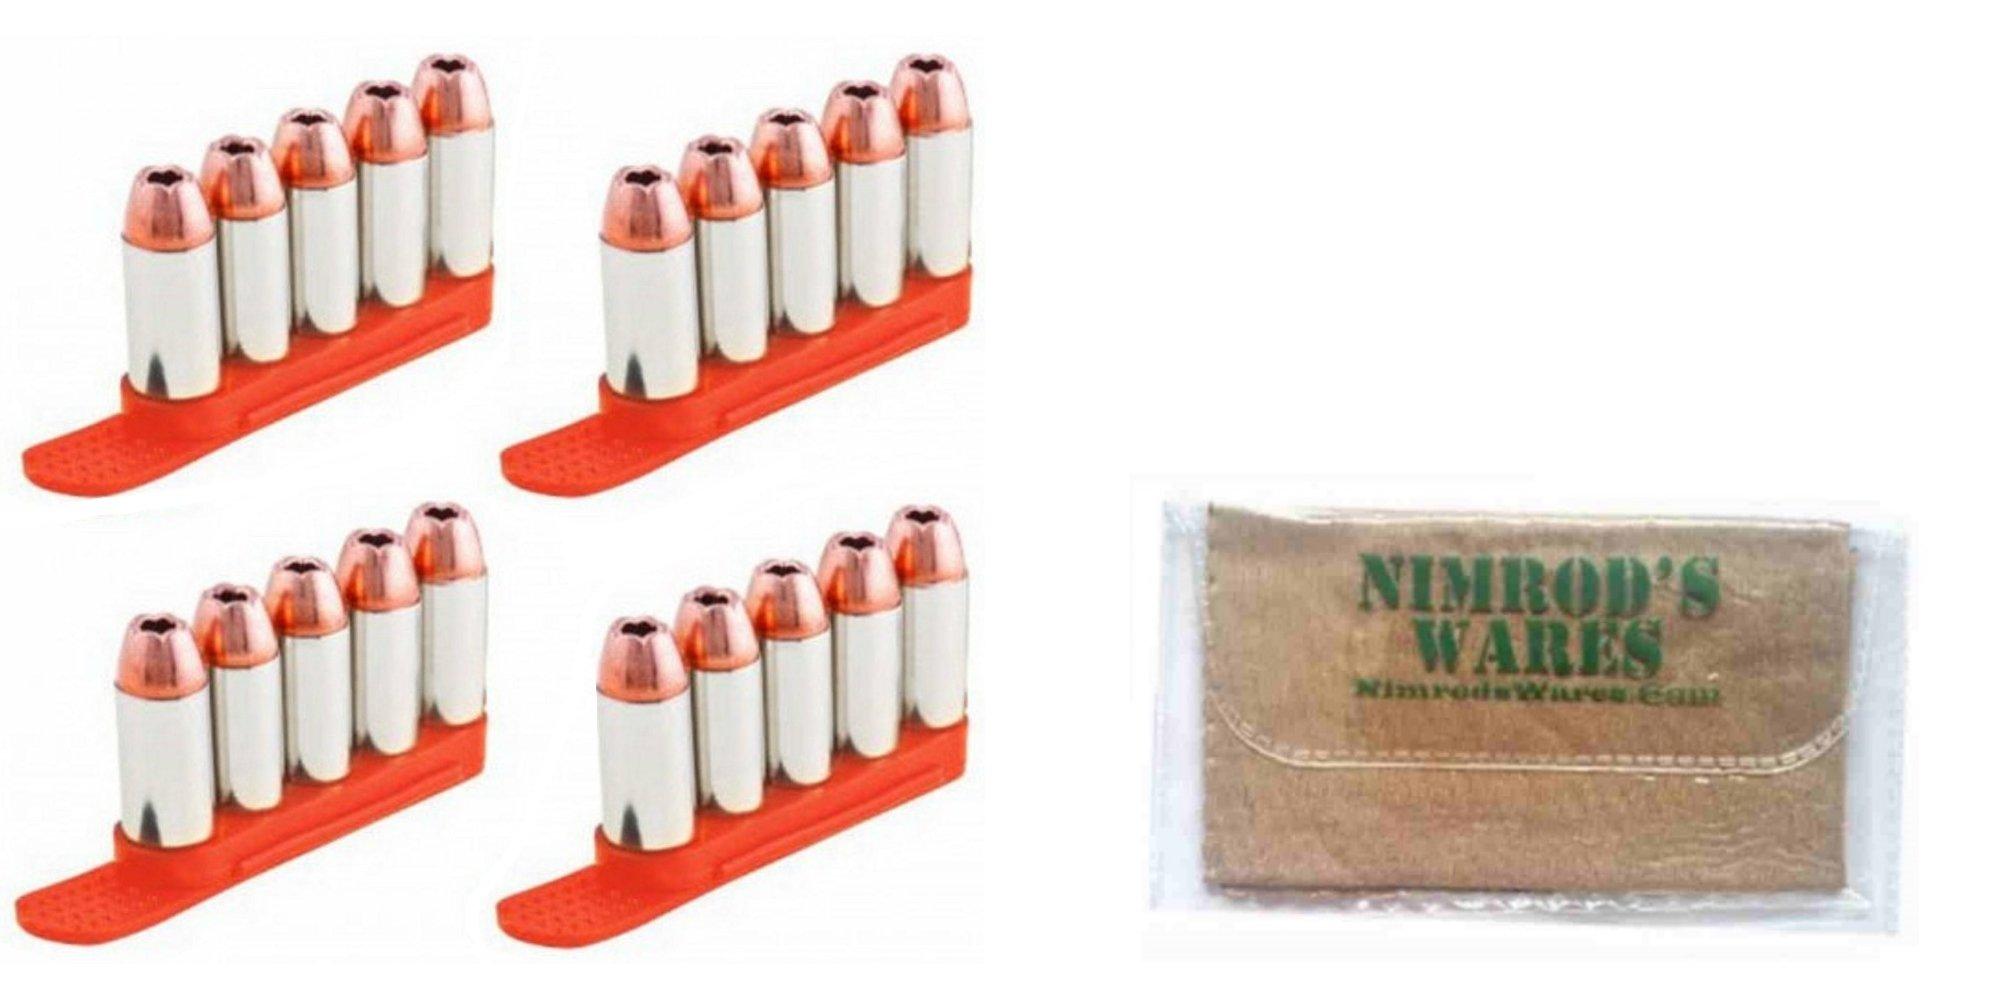 TUFF 7002OR5357 QuickStrips 5Rd .357 .38 .40S&W 6.8mm ORANGE 4Pk Reloader + Nimrod's Wares Microfiber Cloth